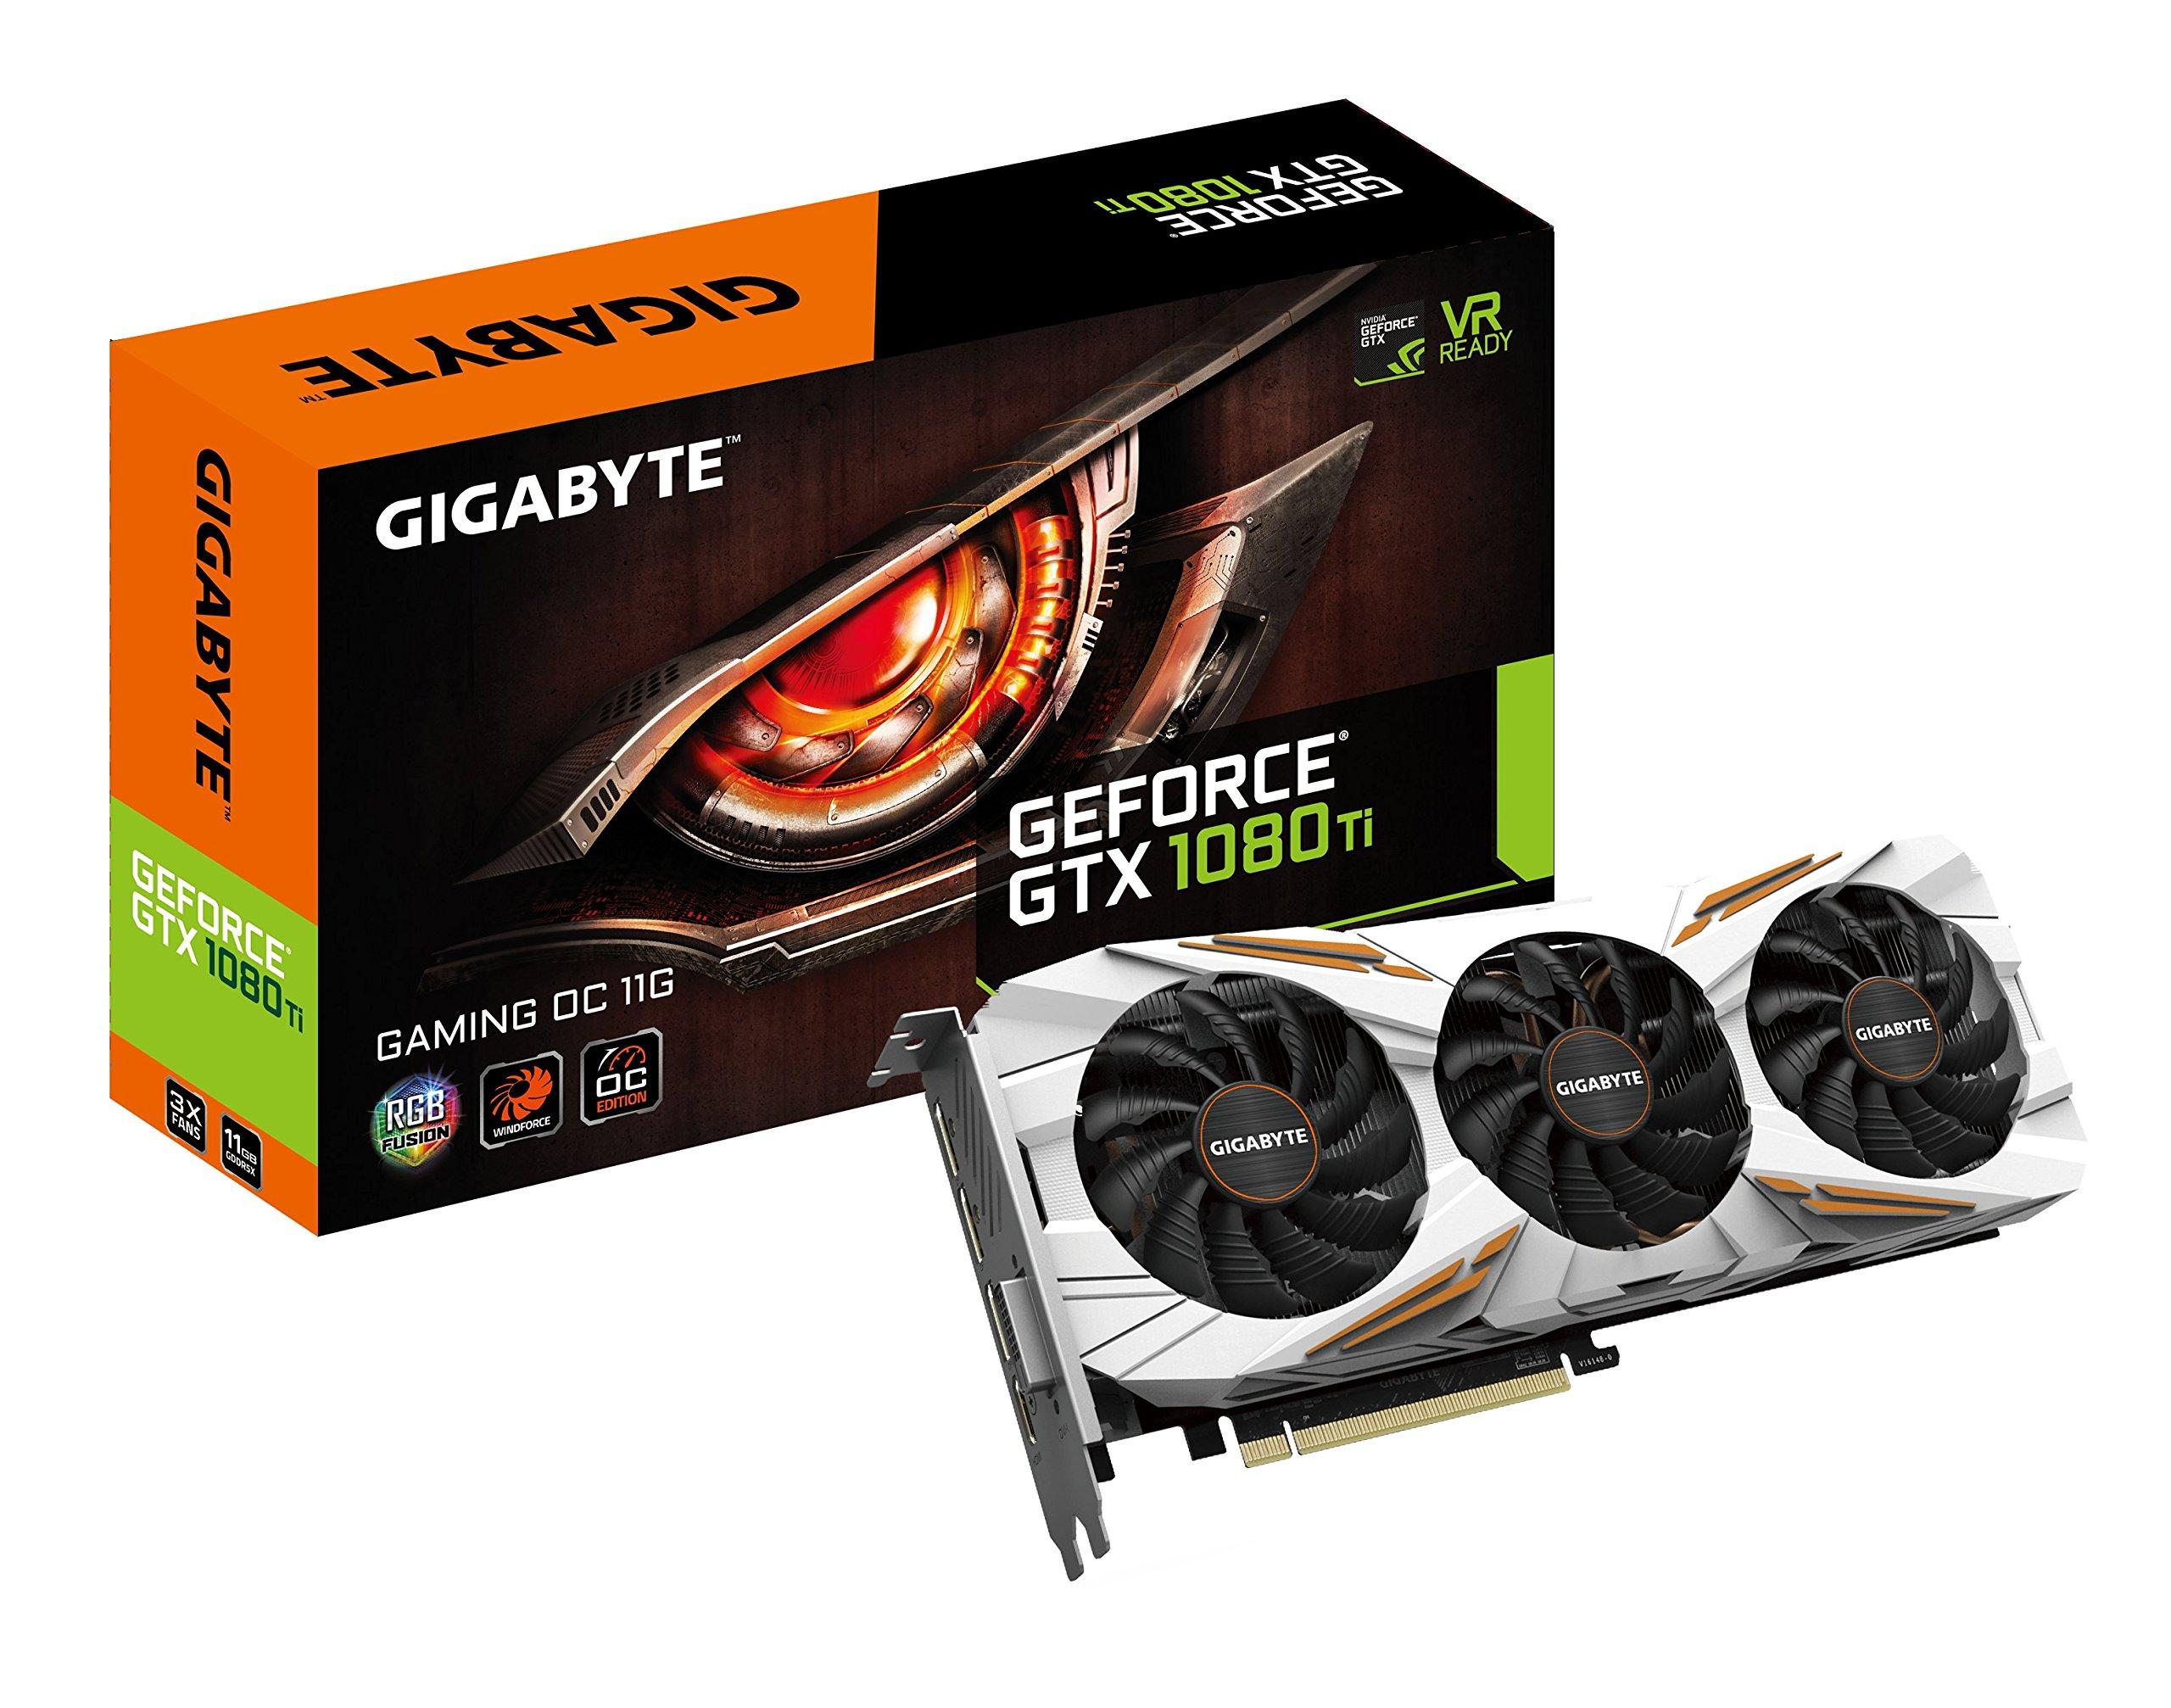 Gigabyte GeForce GTX 1080 Ti GAMING OC 11GB Graphic Cards N108TGAMINGOC-11GD by Gigabyte